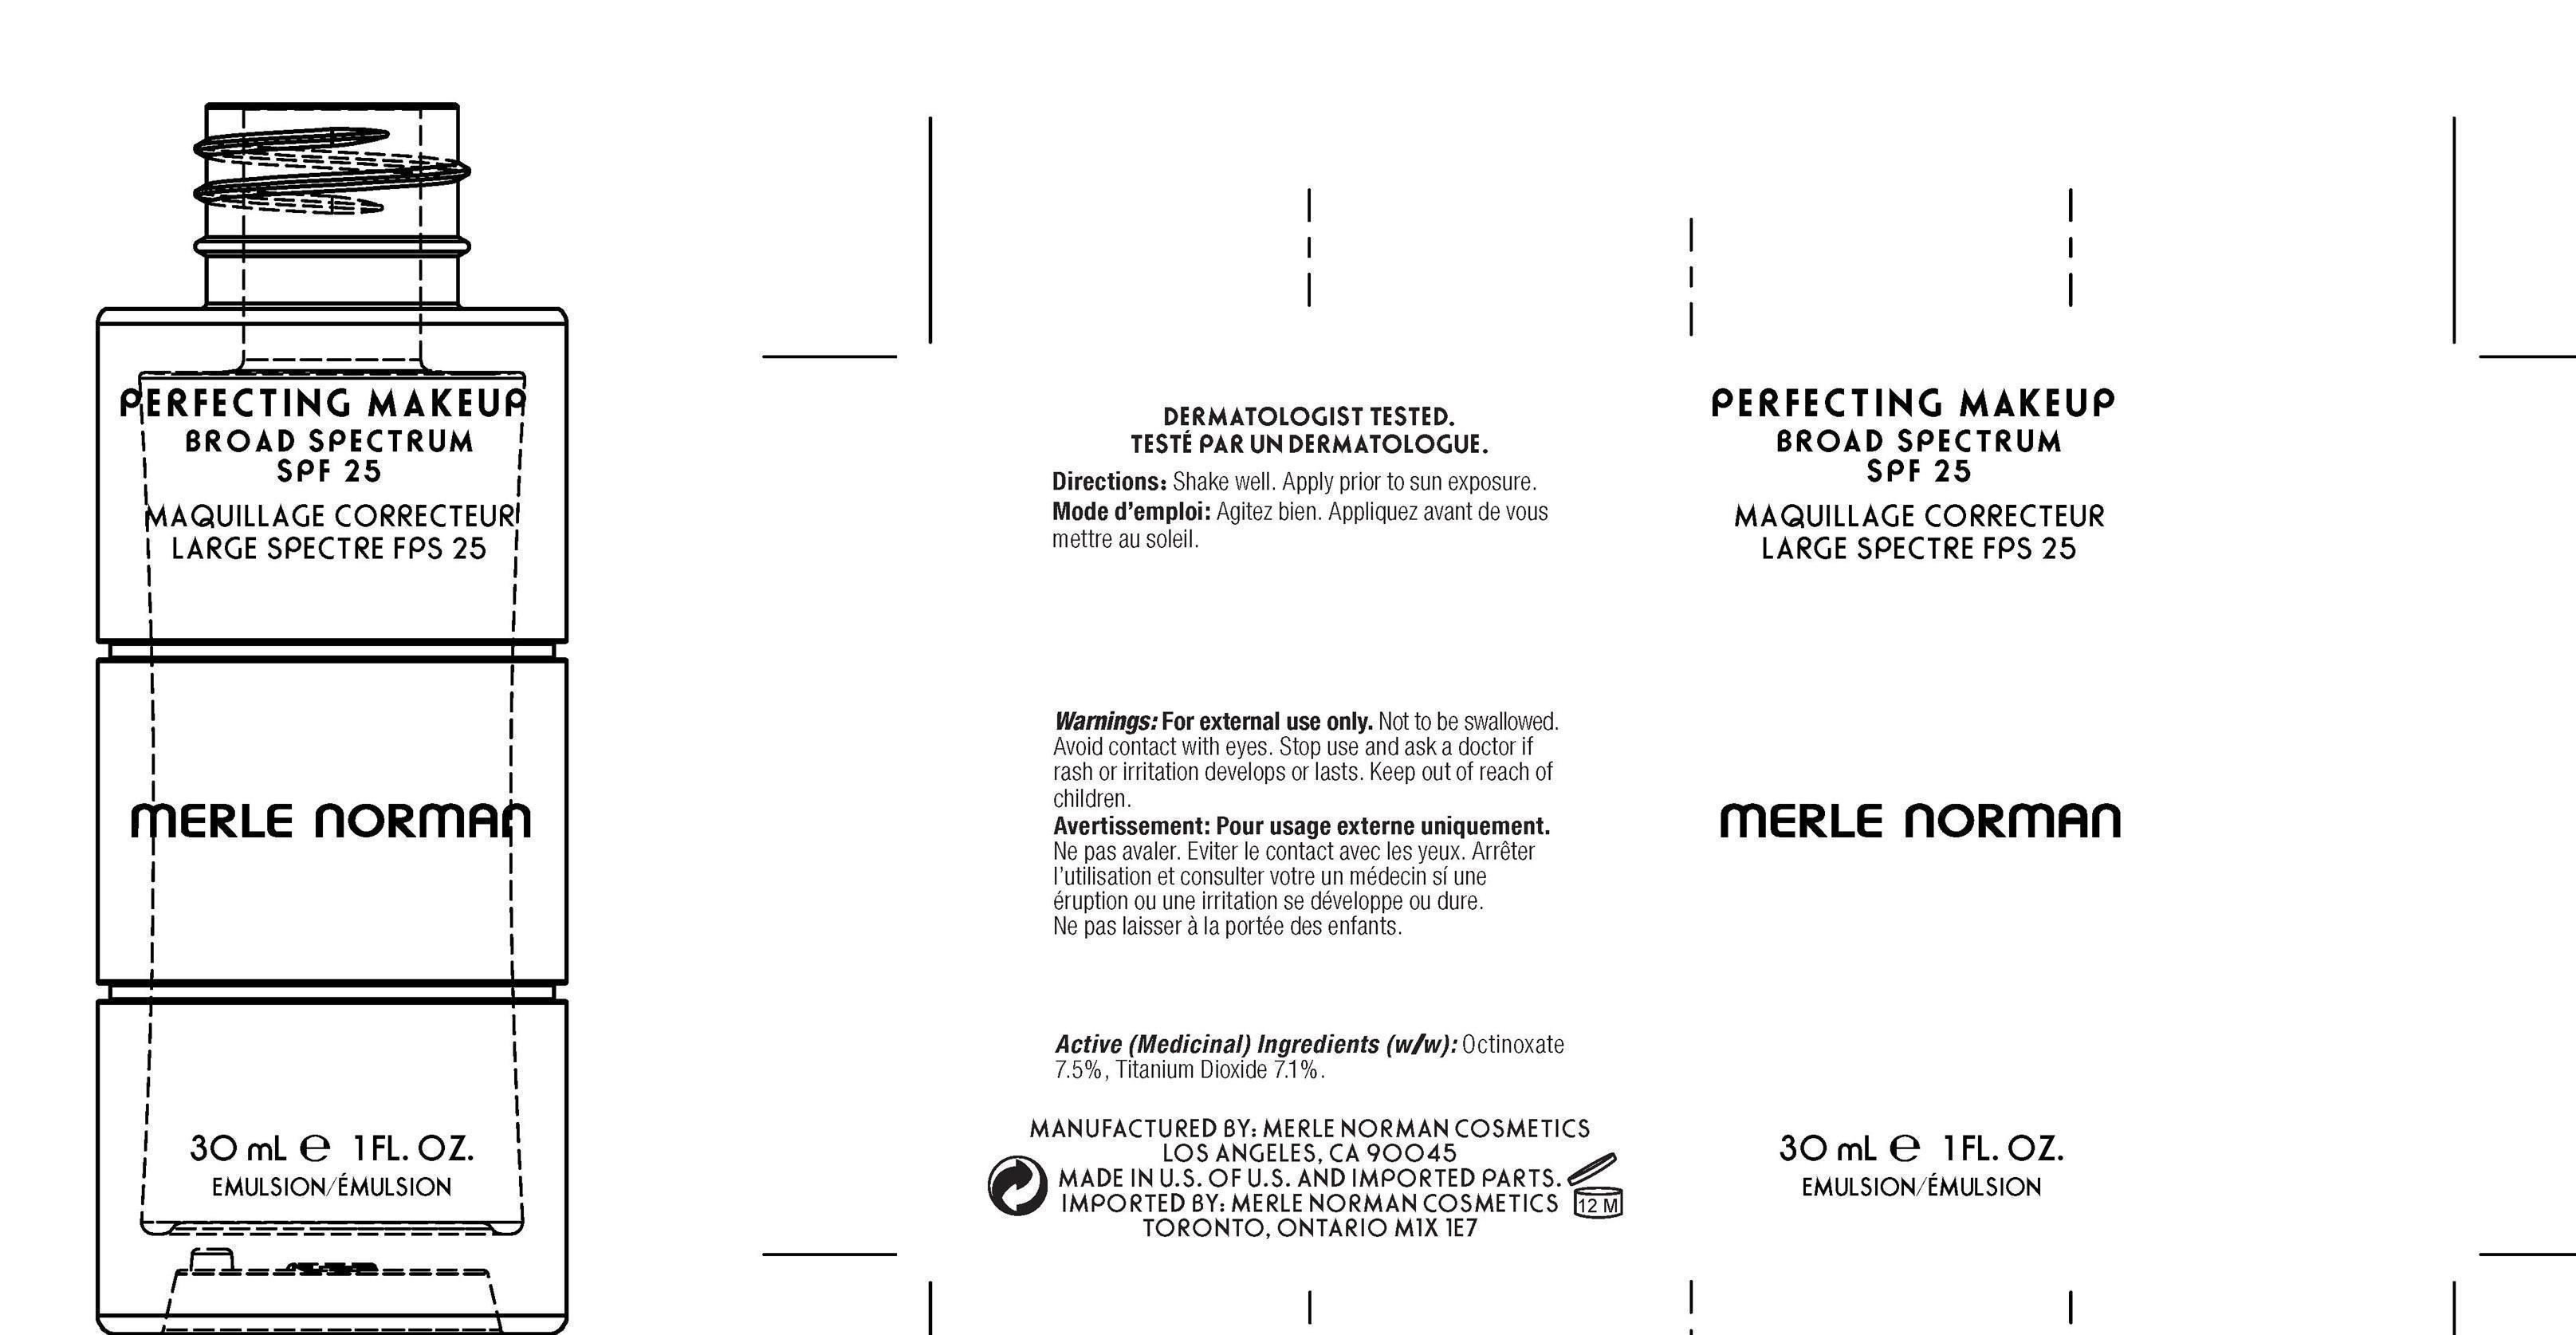 Gemfibrozil Tablet, Film Coated [Ncs Healthcare Of Ky, Inc Dba Vangard Labs]